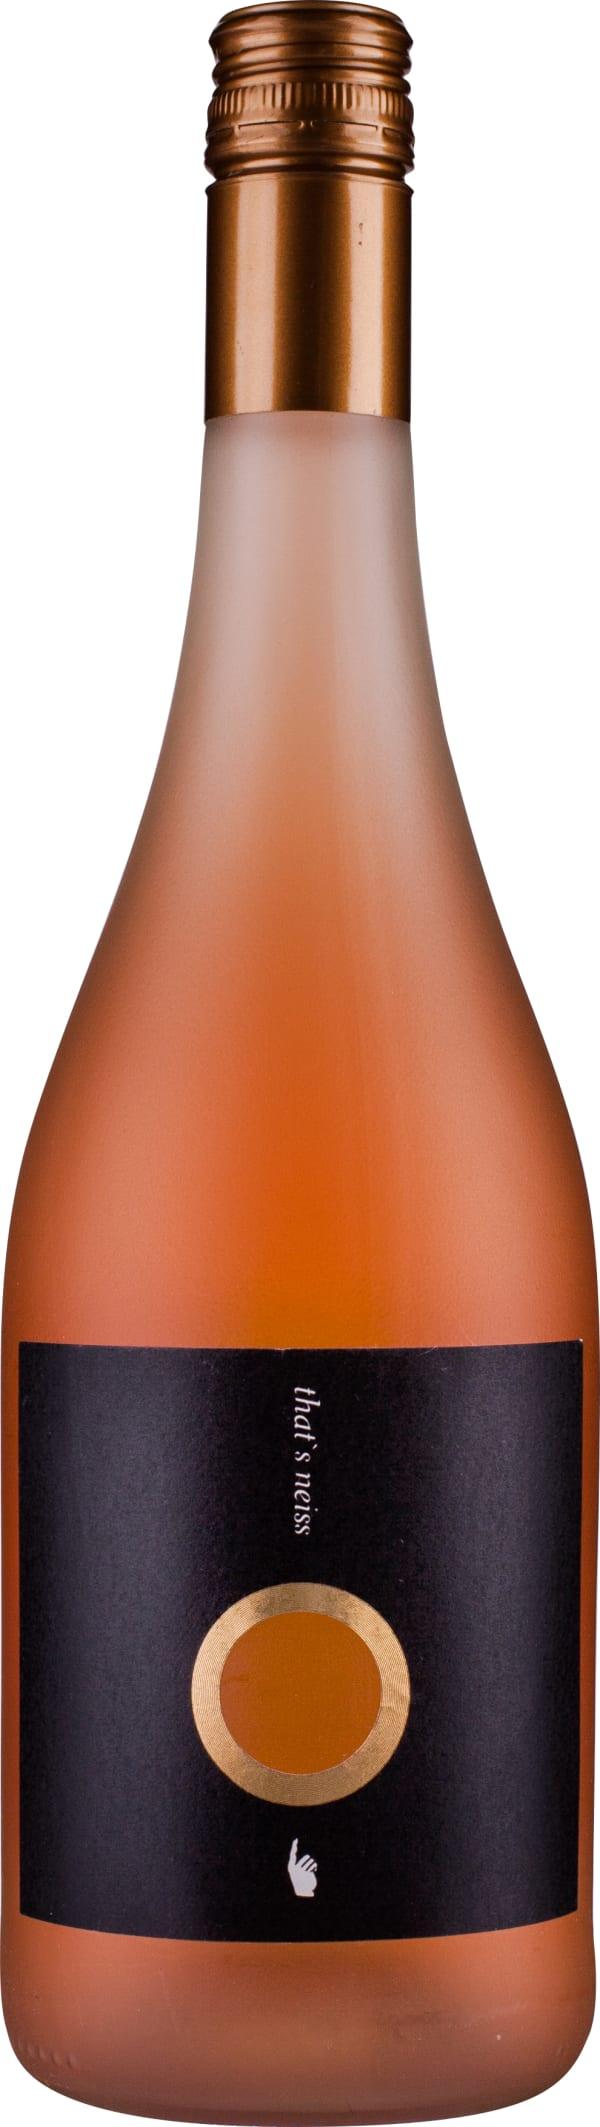 That's Neiss Pinot Noir Rosé Trocken 2020